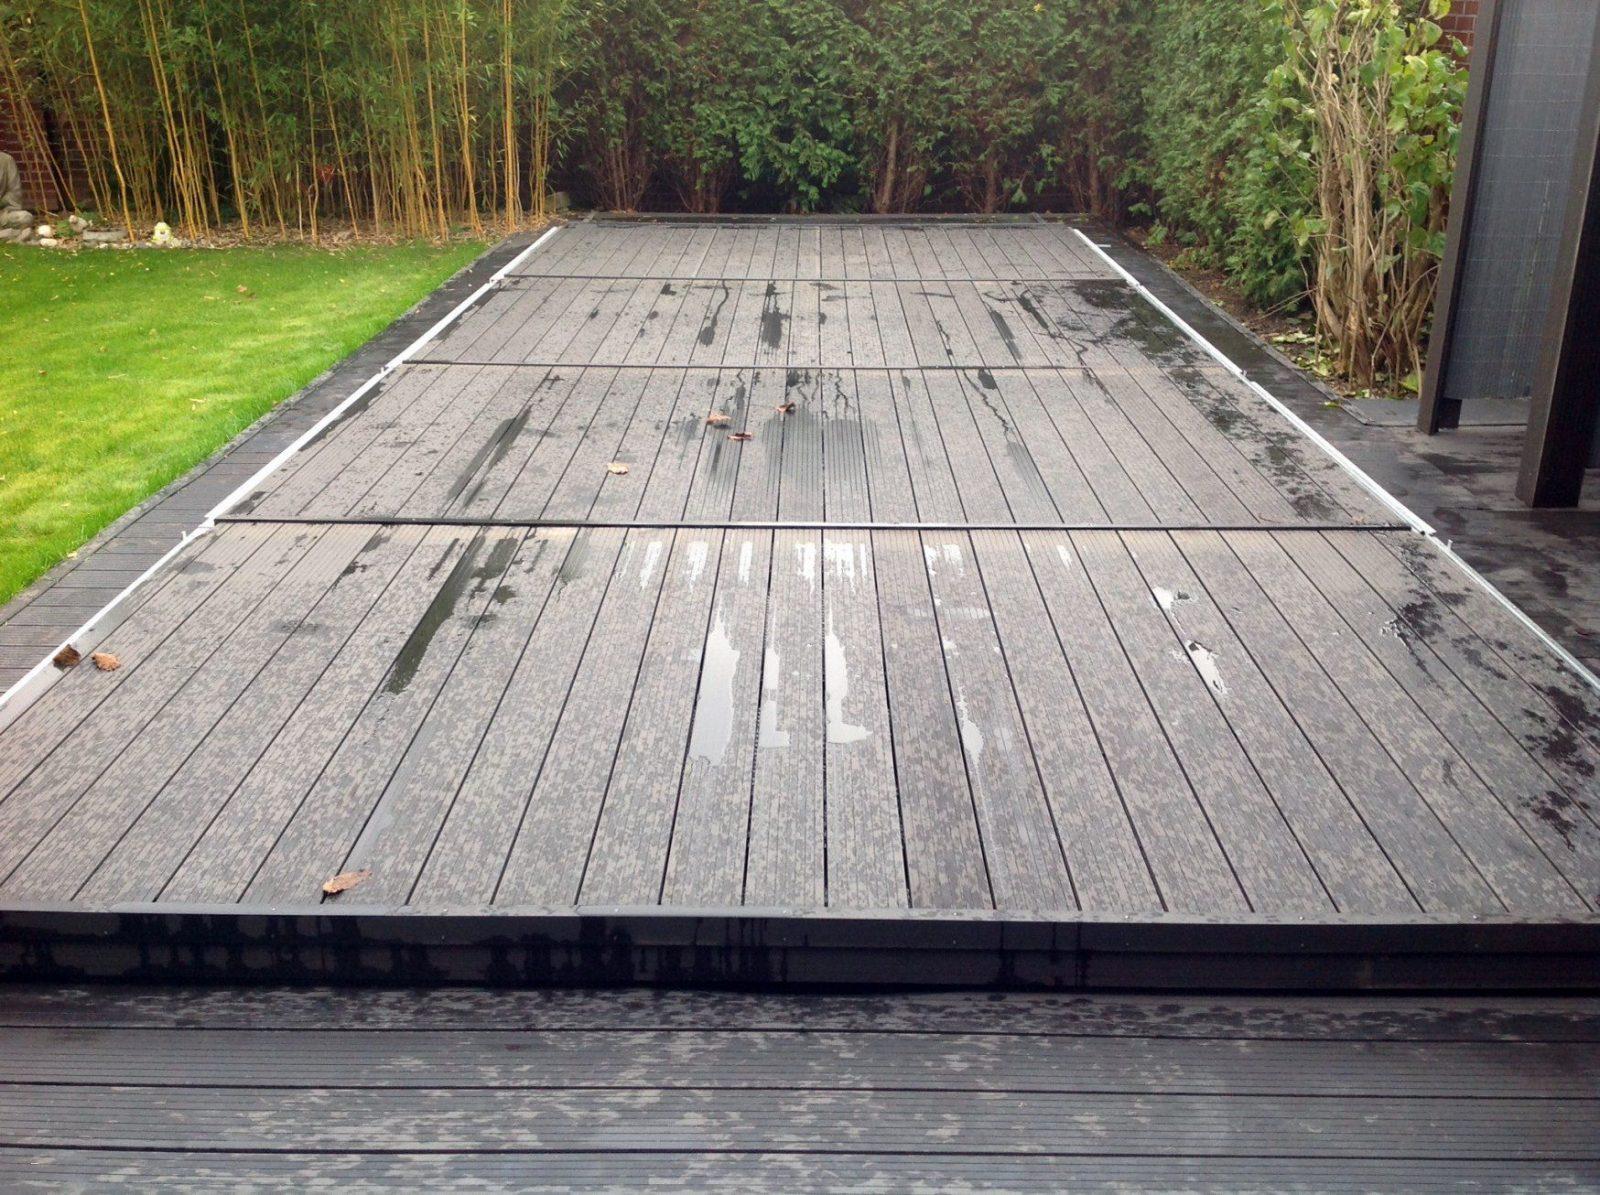 Poolabdeckung Terrasse Elegant Terrasse Bauen Holz Garten Terrasse von Poolabdeckung Aus Holz Selber Bauen Bild